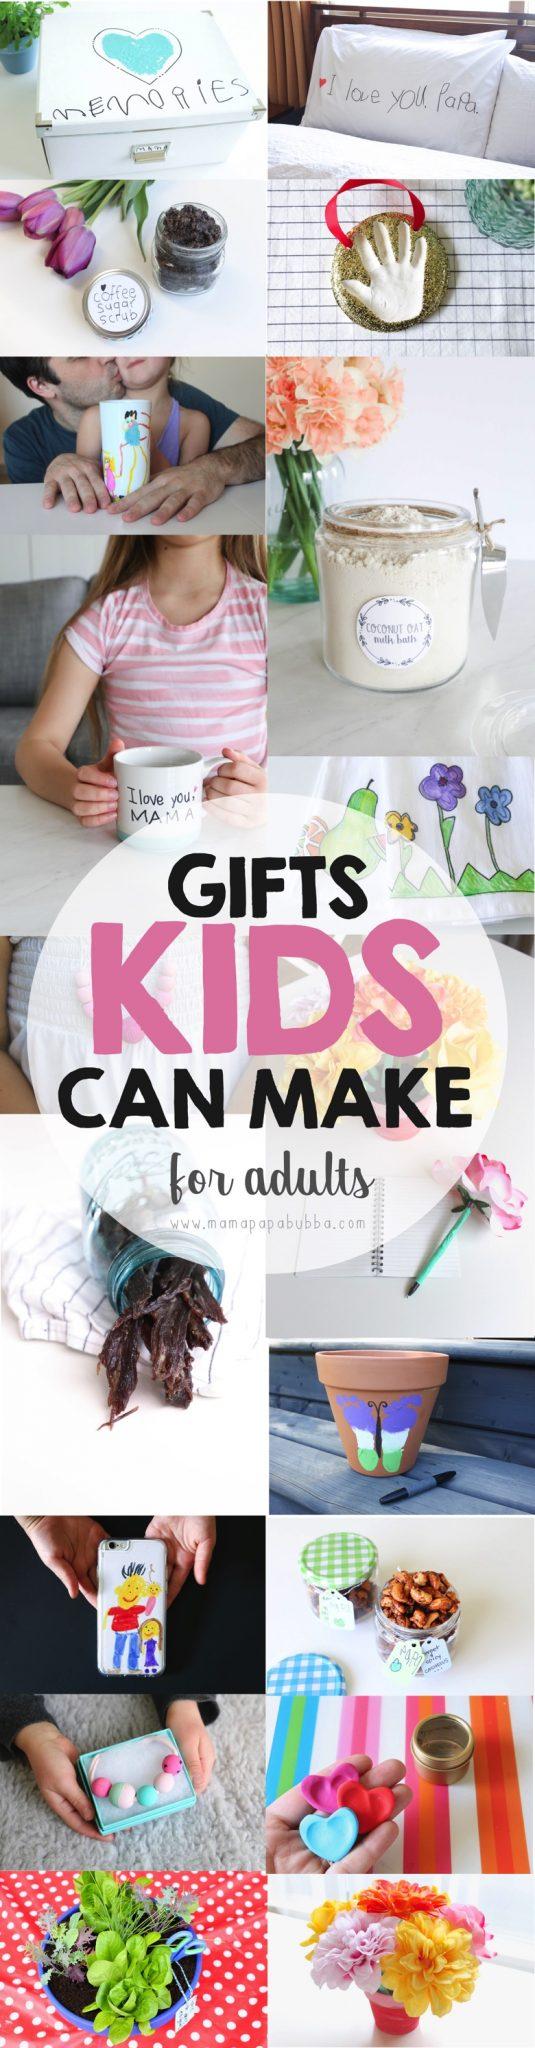 Creative Gifts Kids Can Make for Adults | Mama Papa Bubba